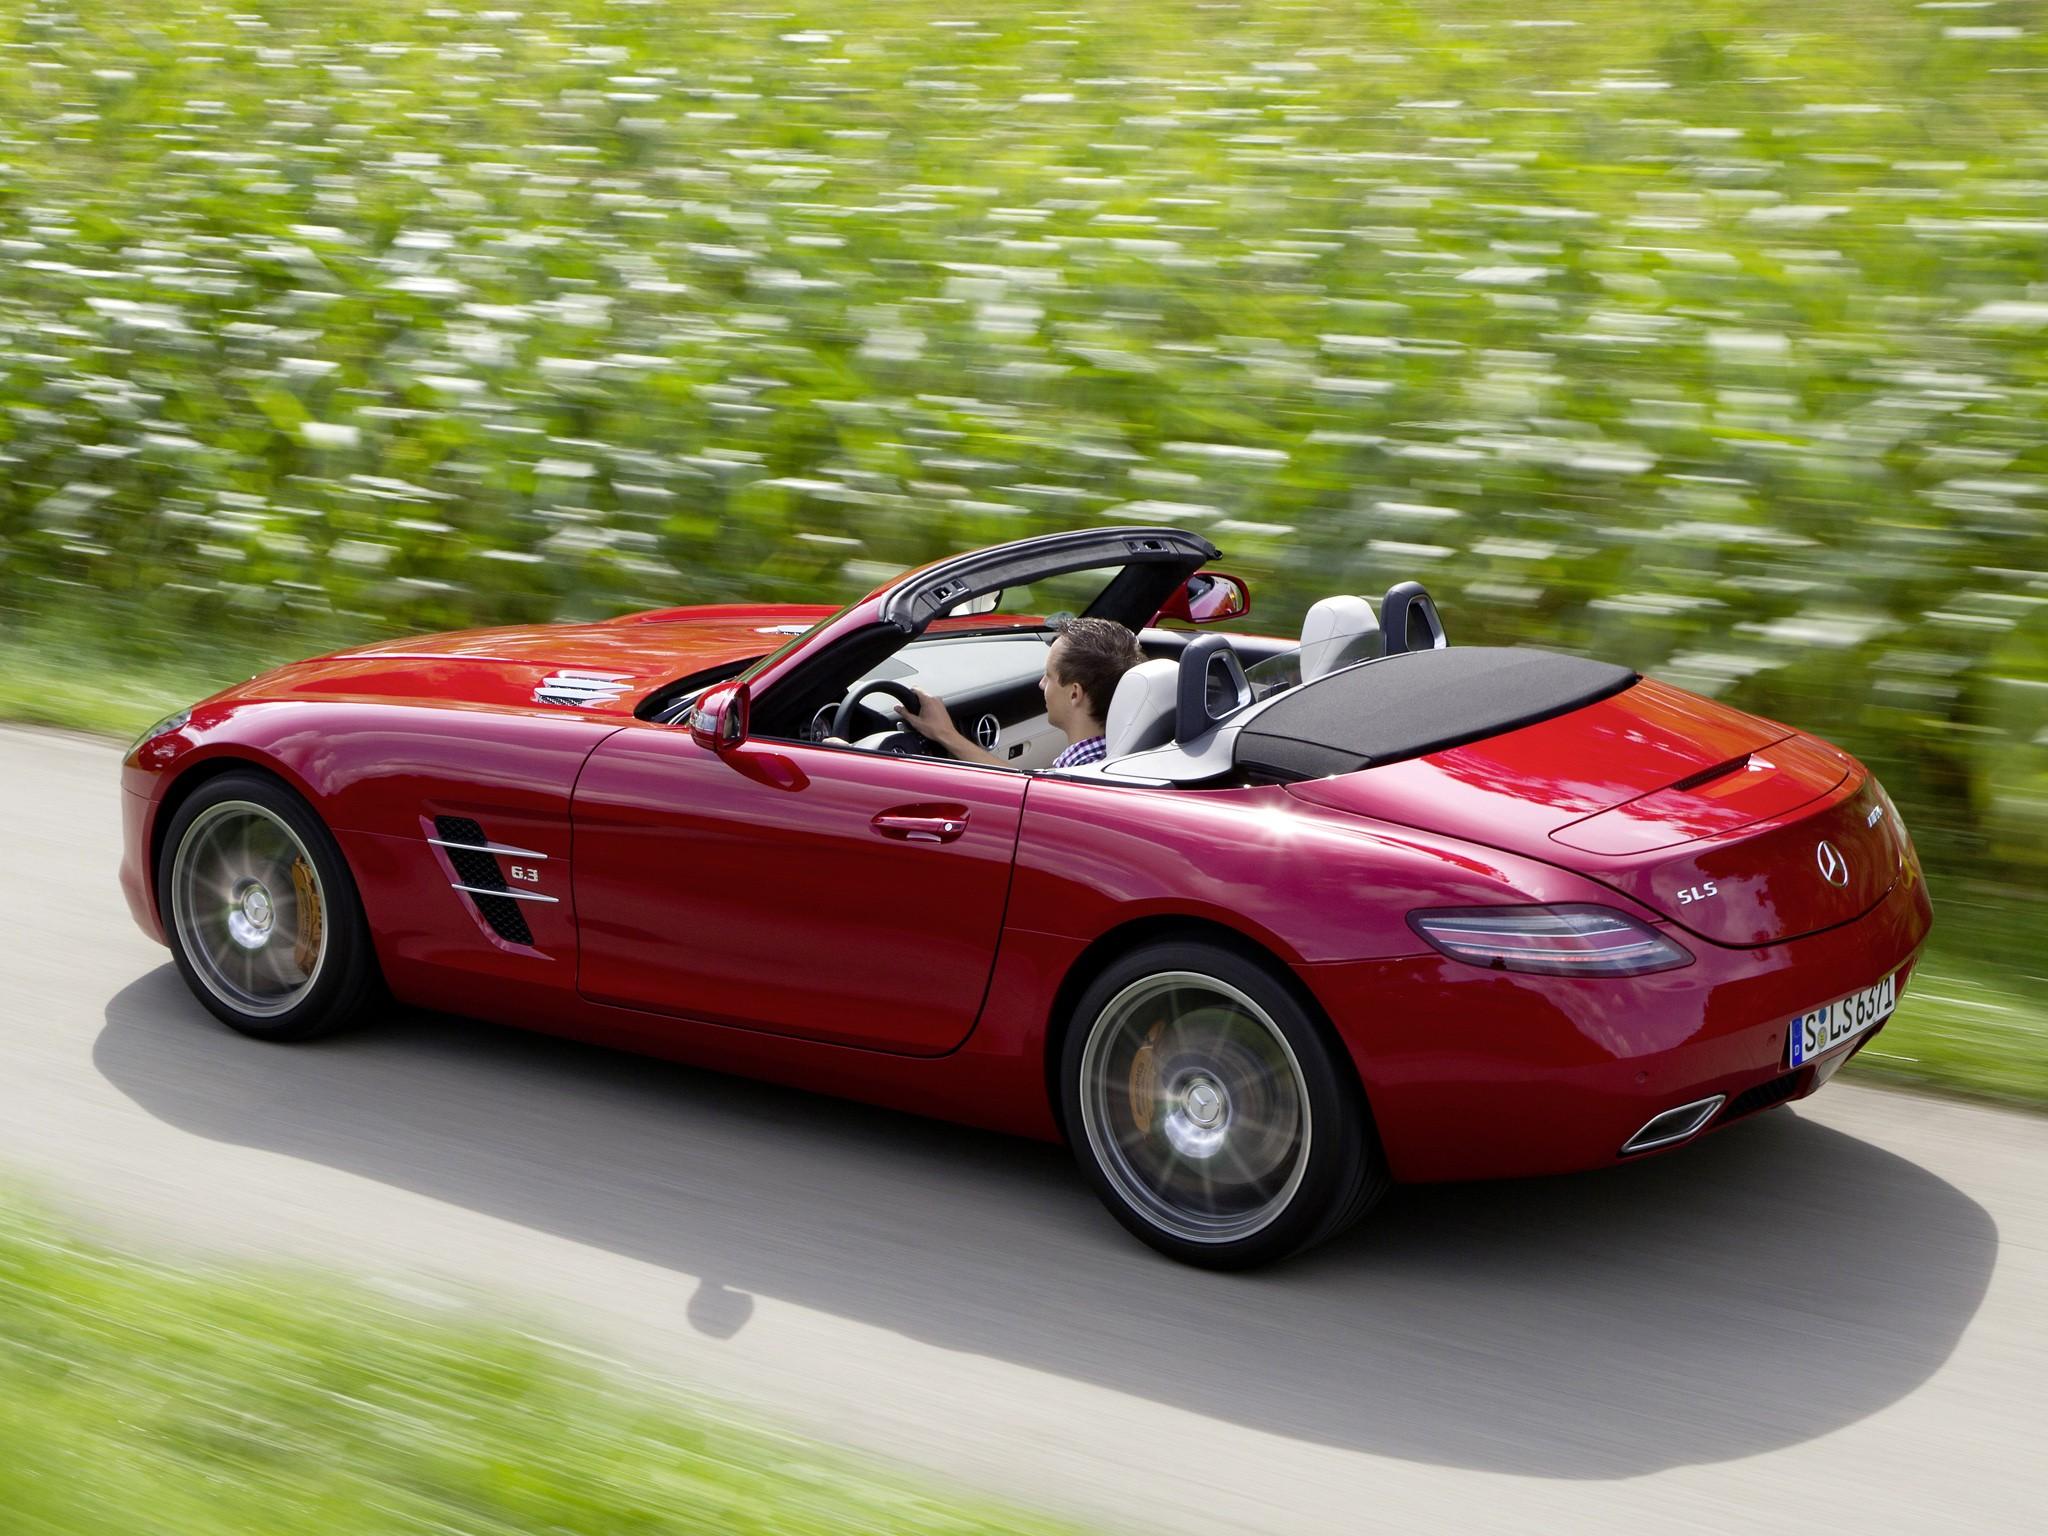 Mercedes benz sls amg roadster c197 specs 2011 2012 for Mercedes benz roadster amg